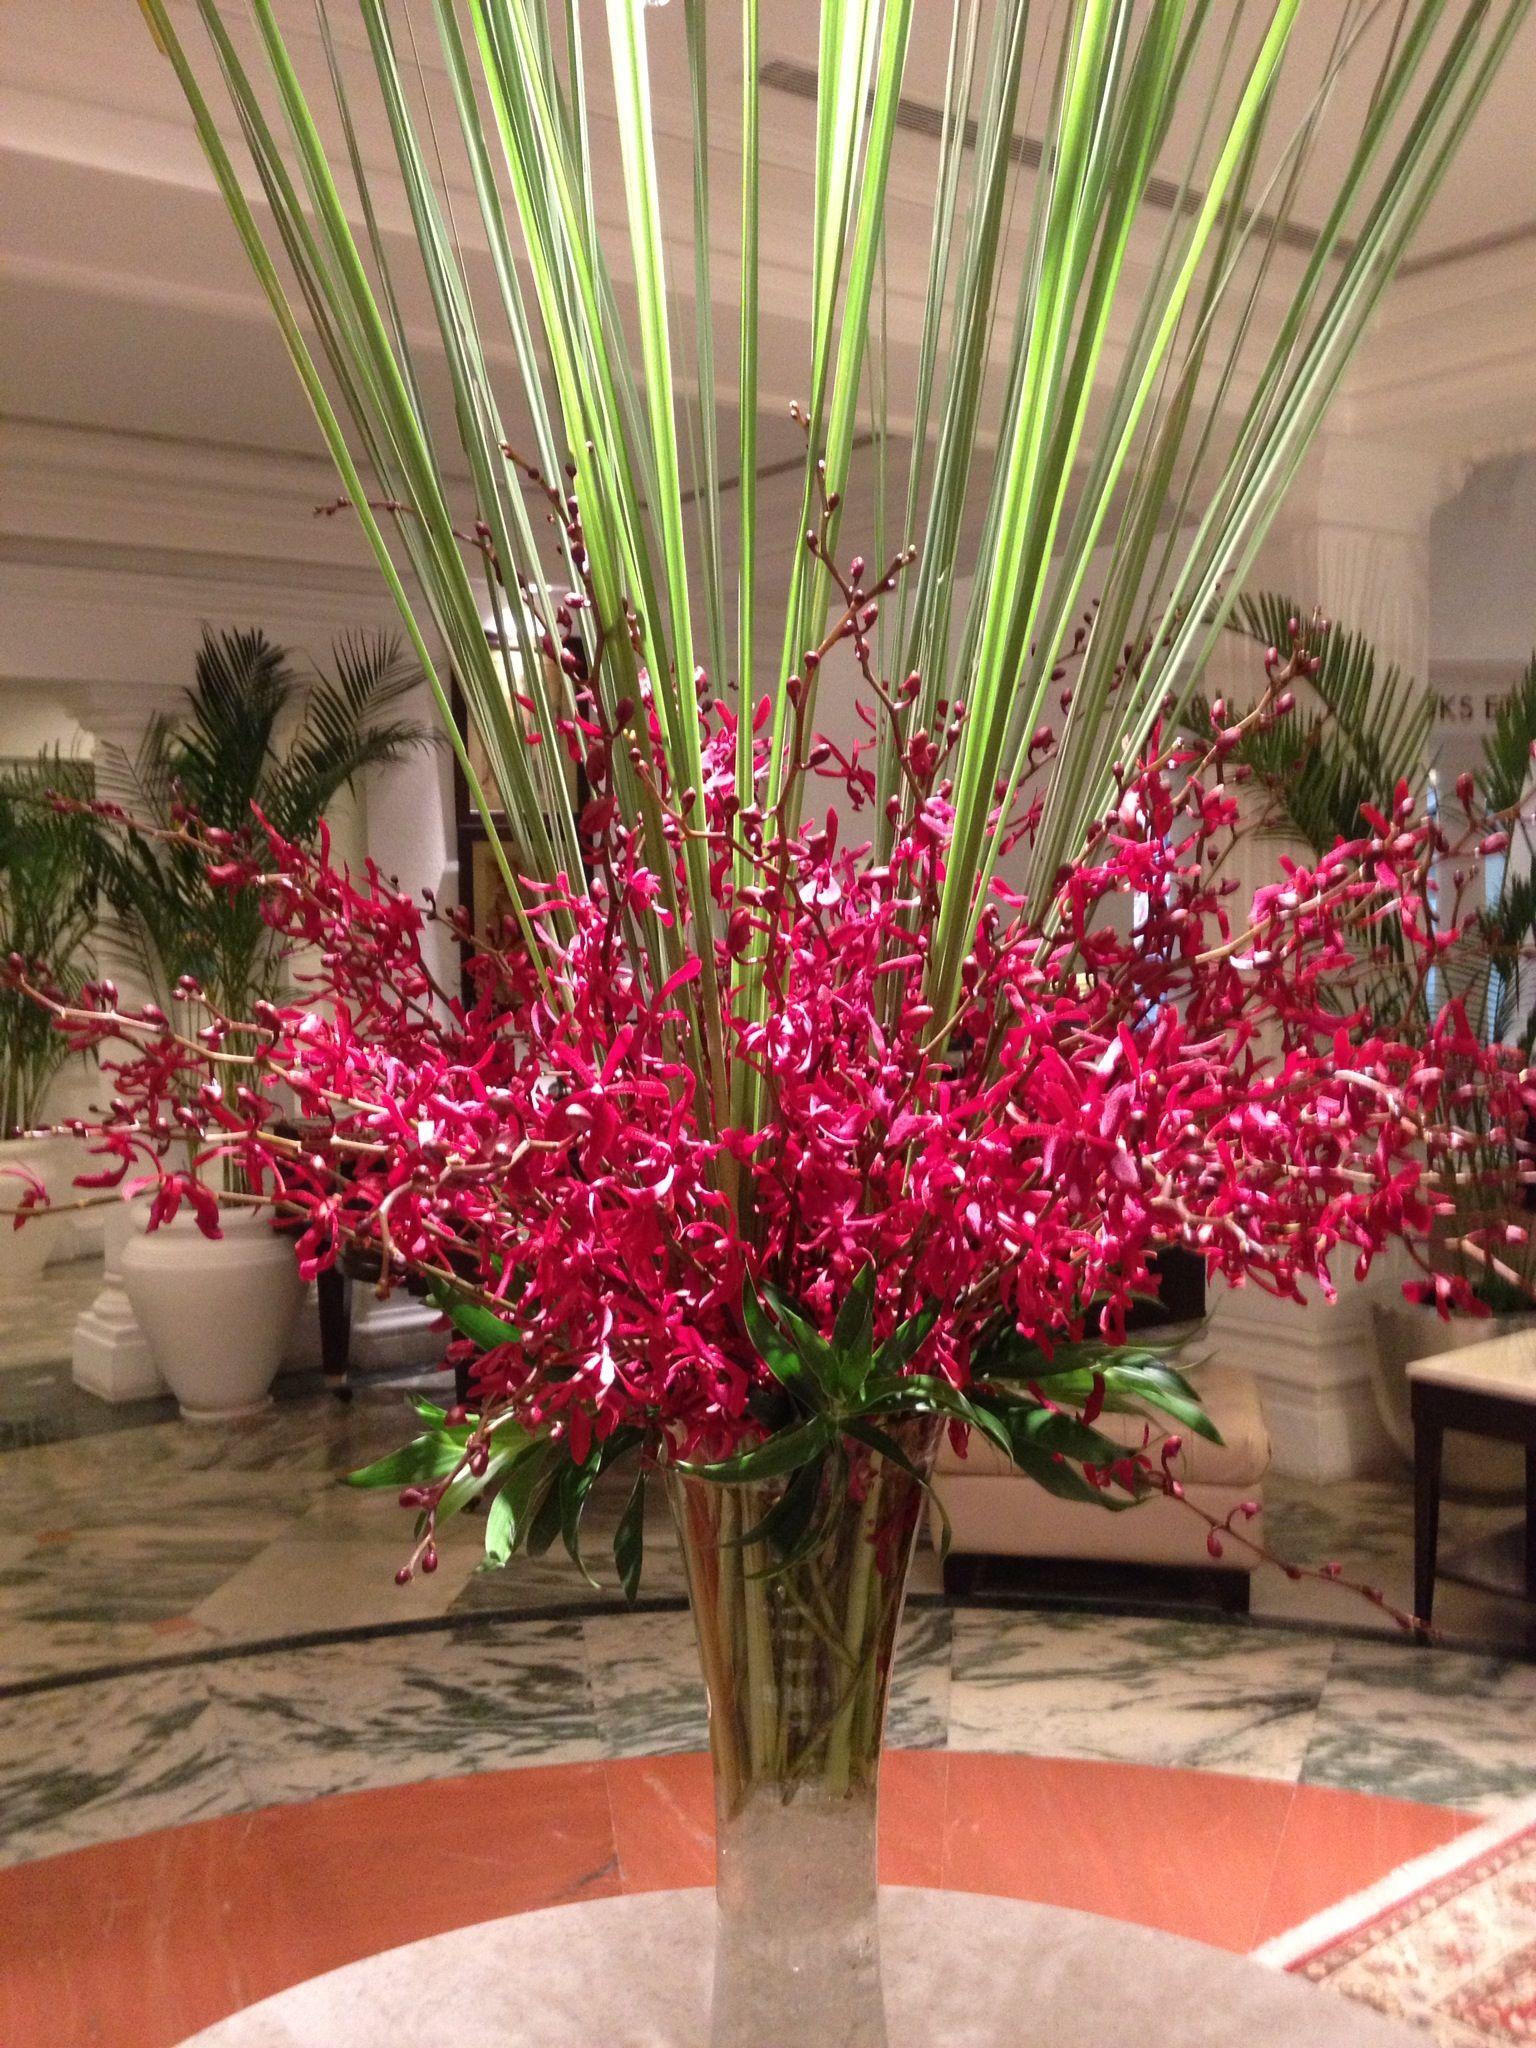 Claridges Hotel Tropical Flower Arrangements Hotel Flowers Flower Arrangements